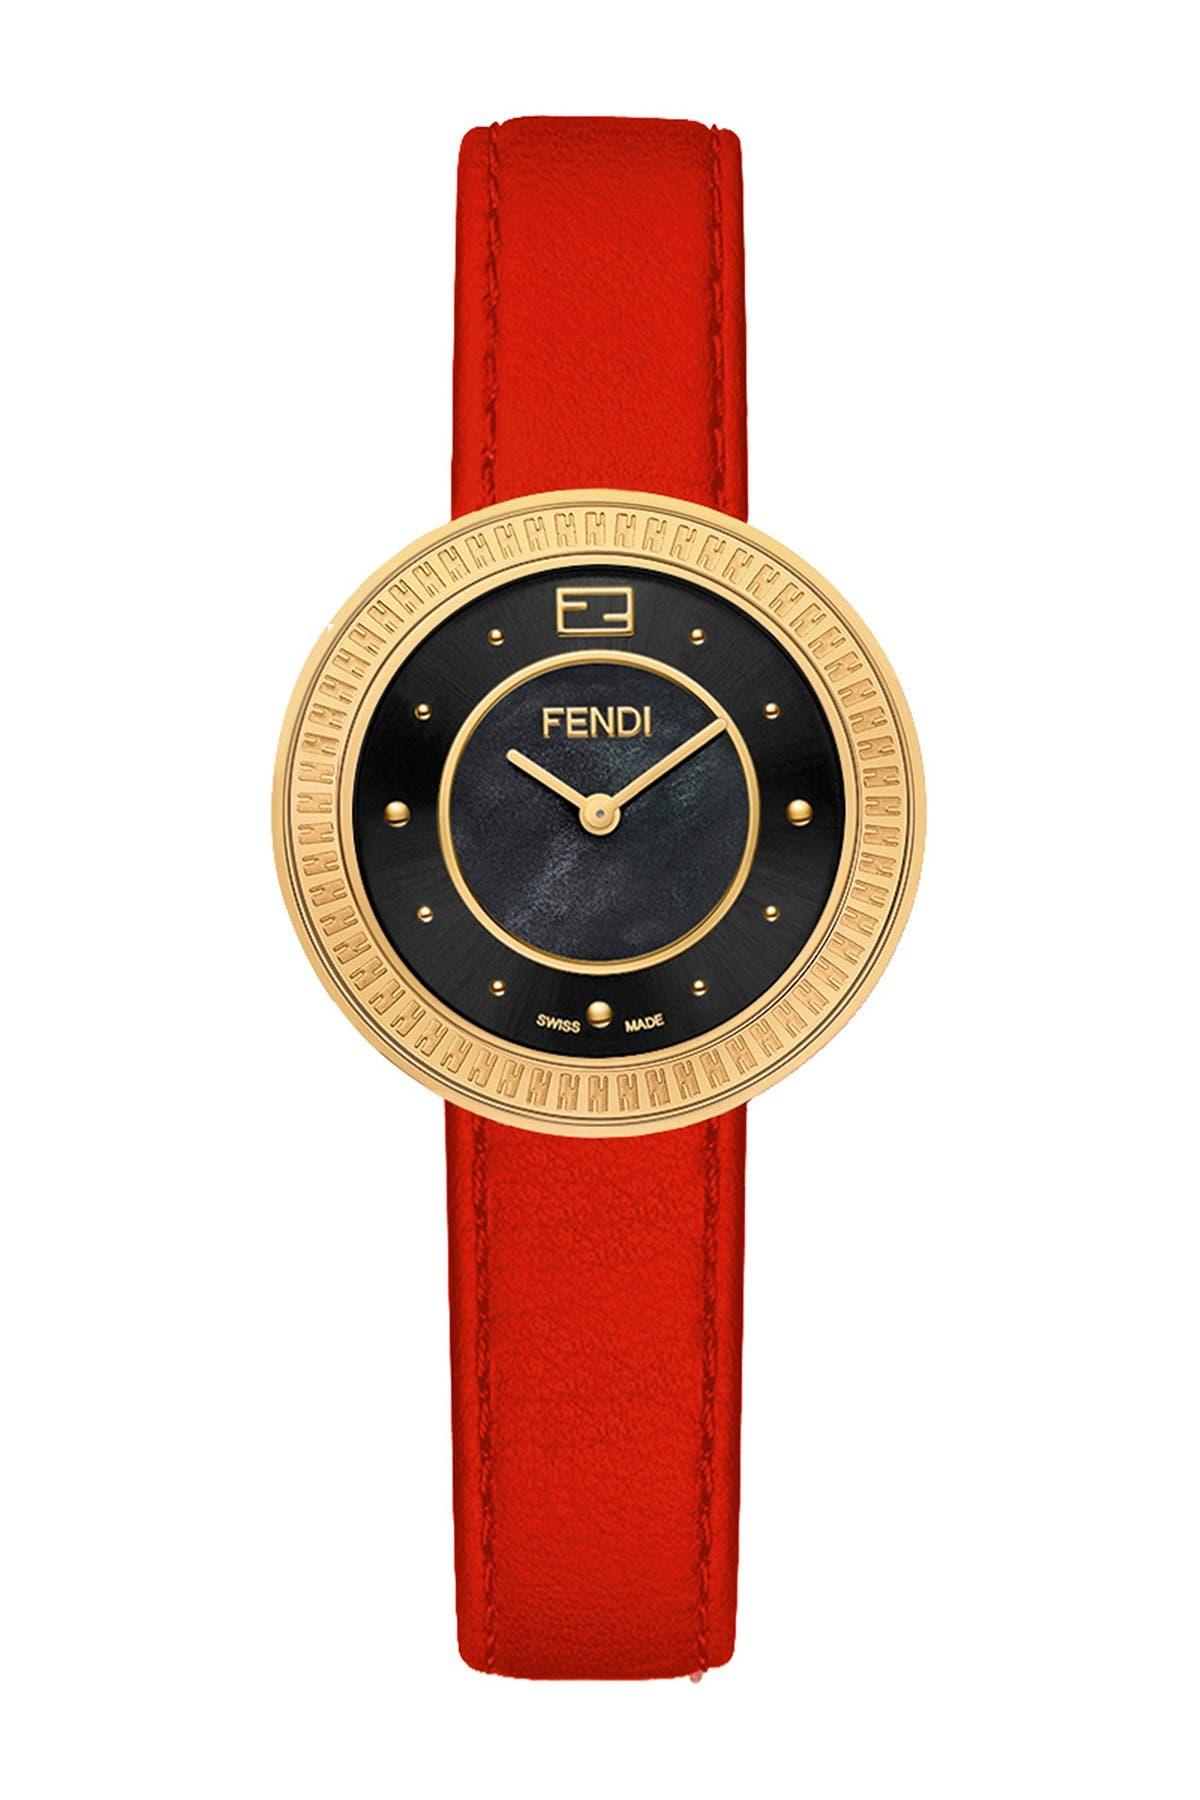 Image of FENDI Women's Fendi My Way Leather Strap Watch, 28mm